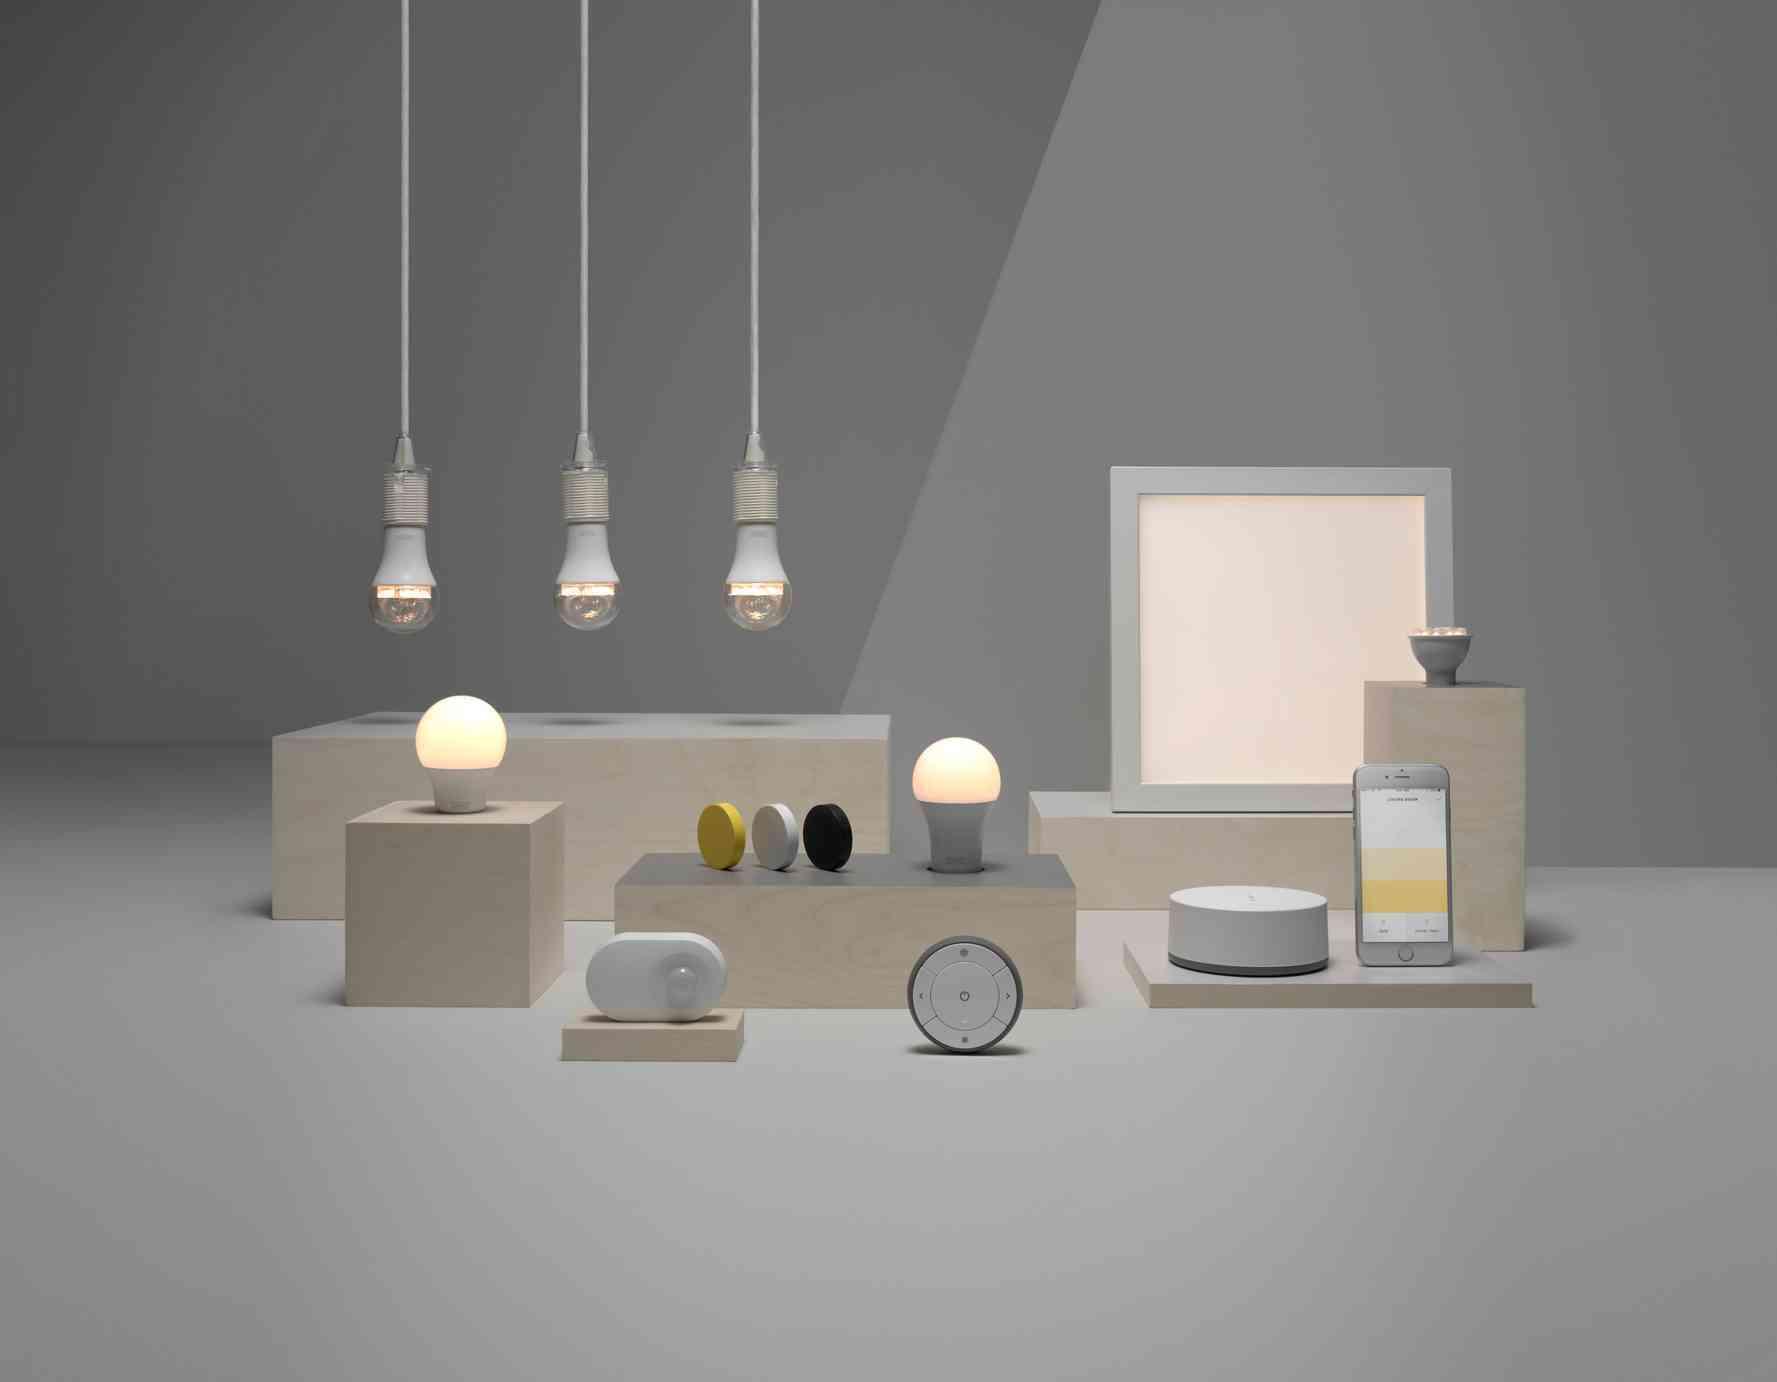 Novedades en iluminación de casas inteligentes con IKEA 55